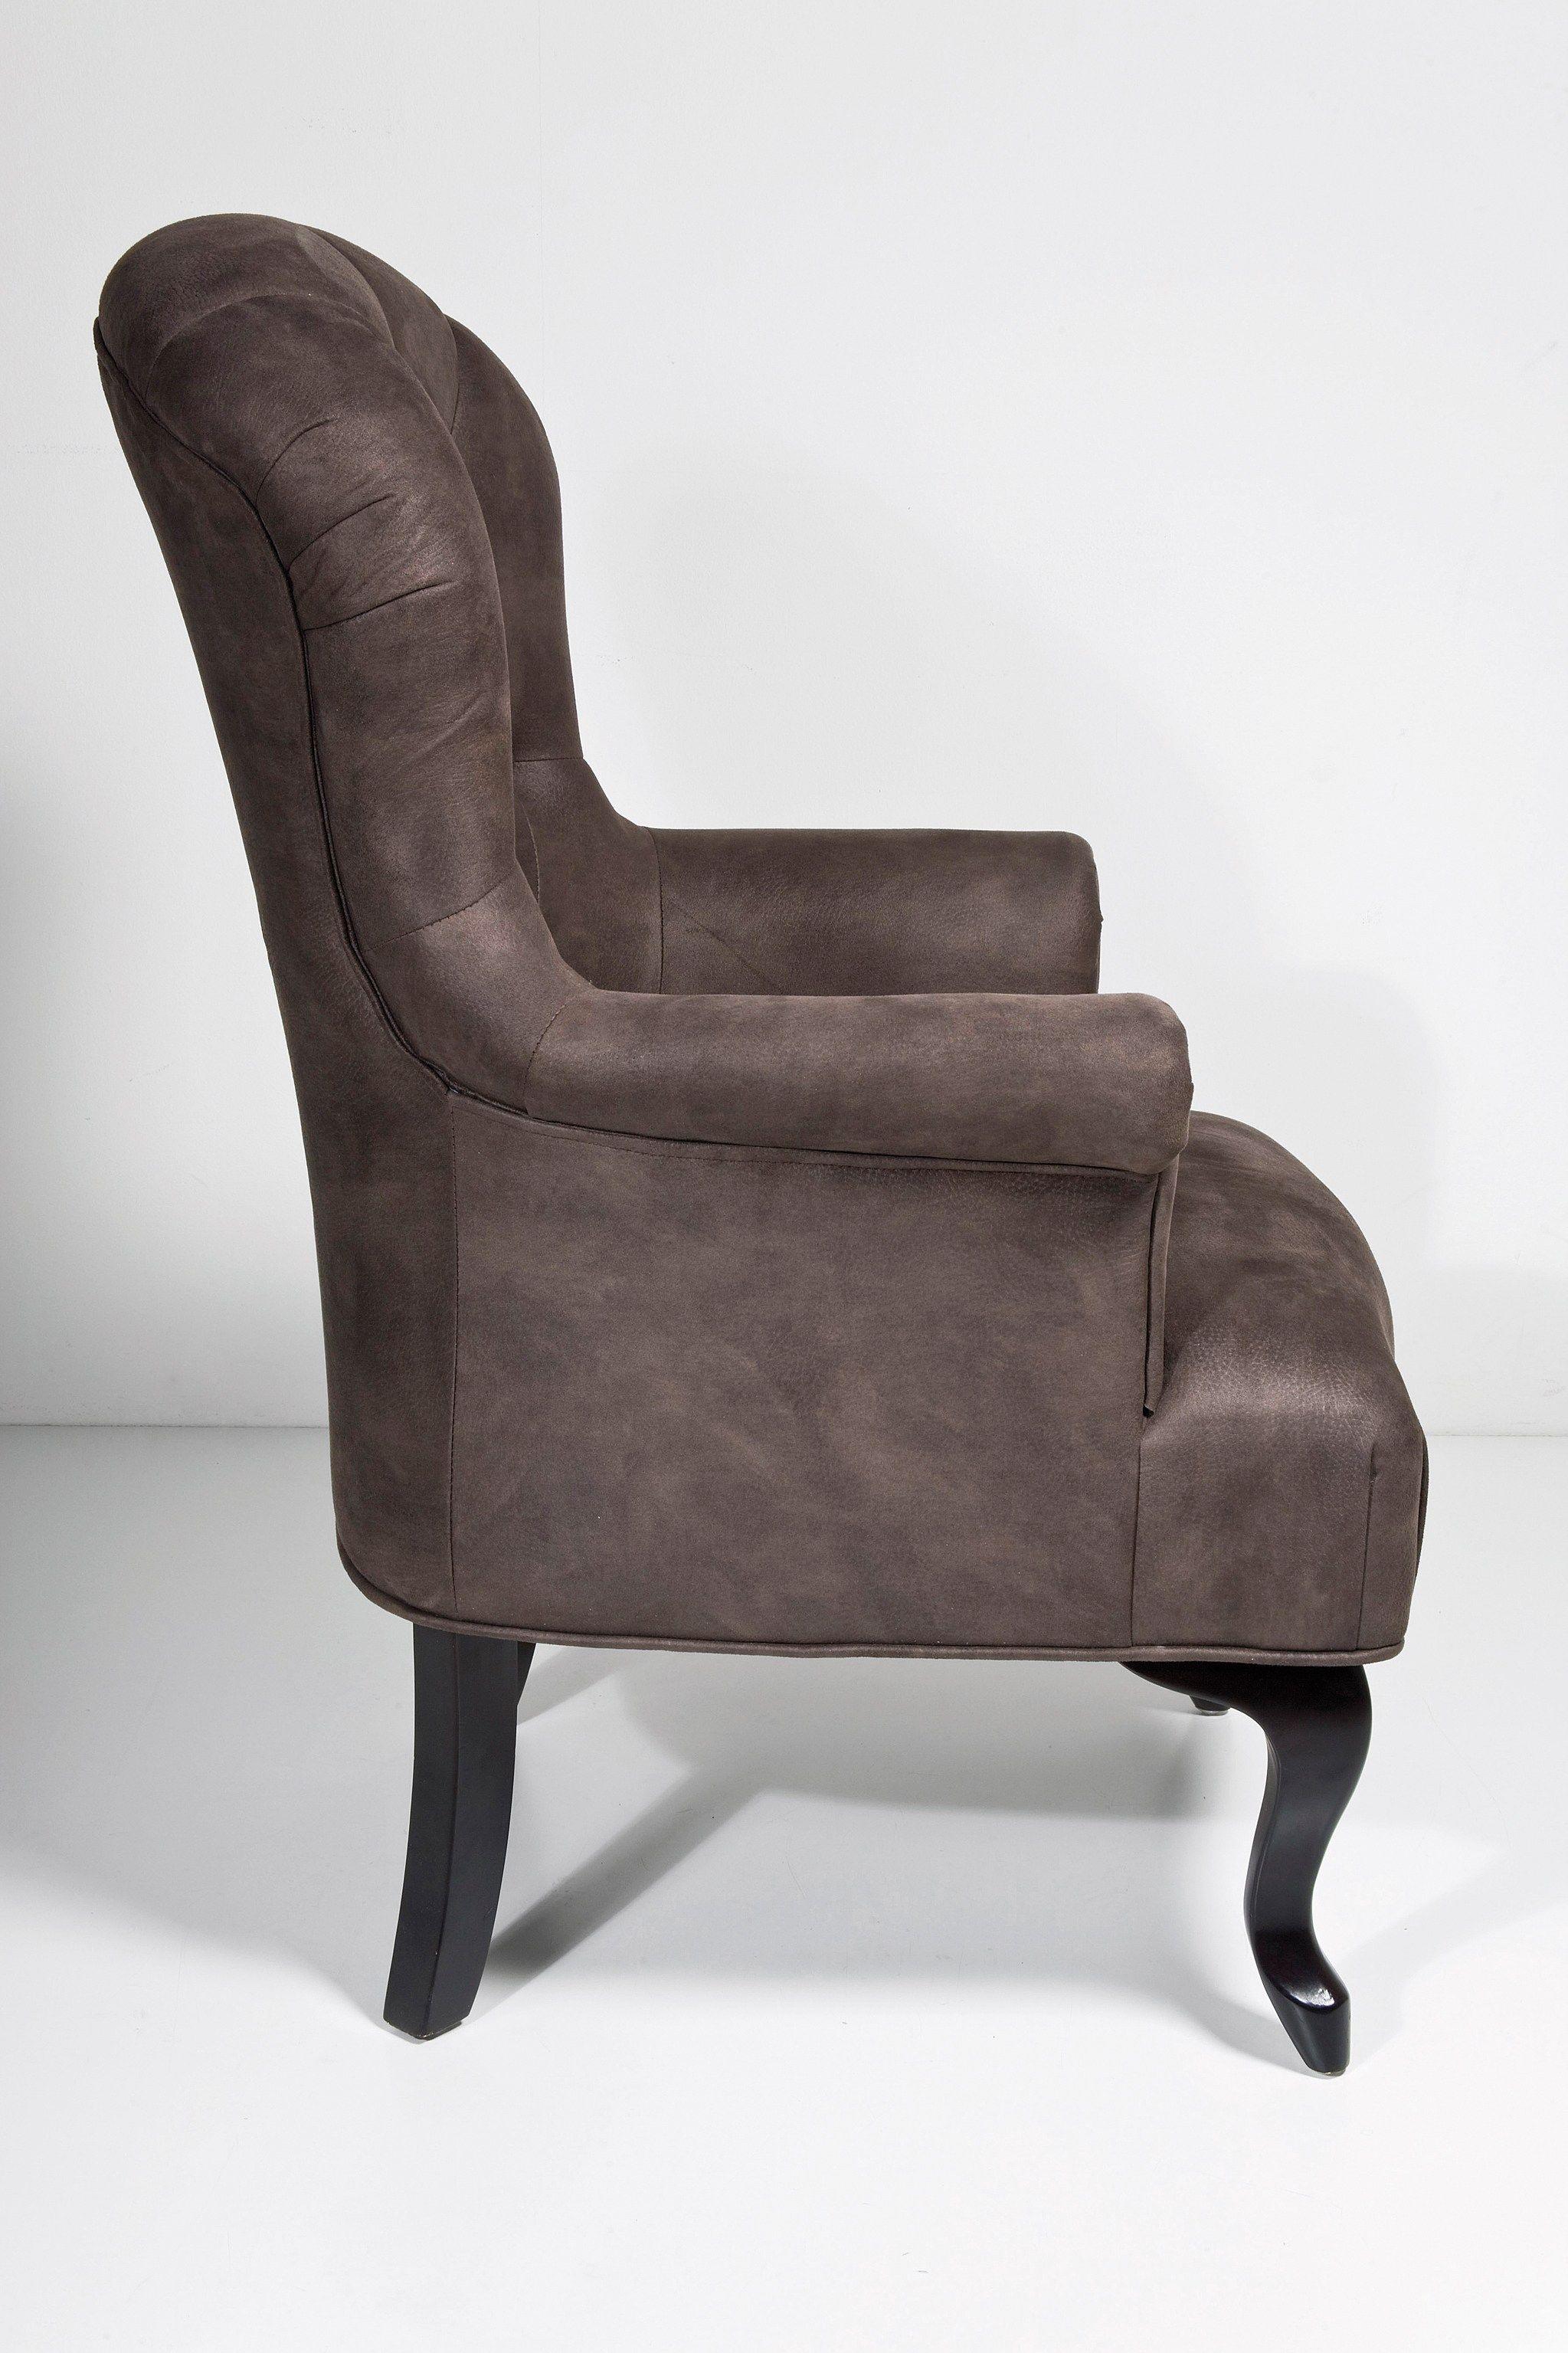 Poltrona a orecchioni relax in pelle cafehouse by kare design - Poltrona relax design ...